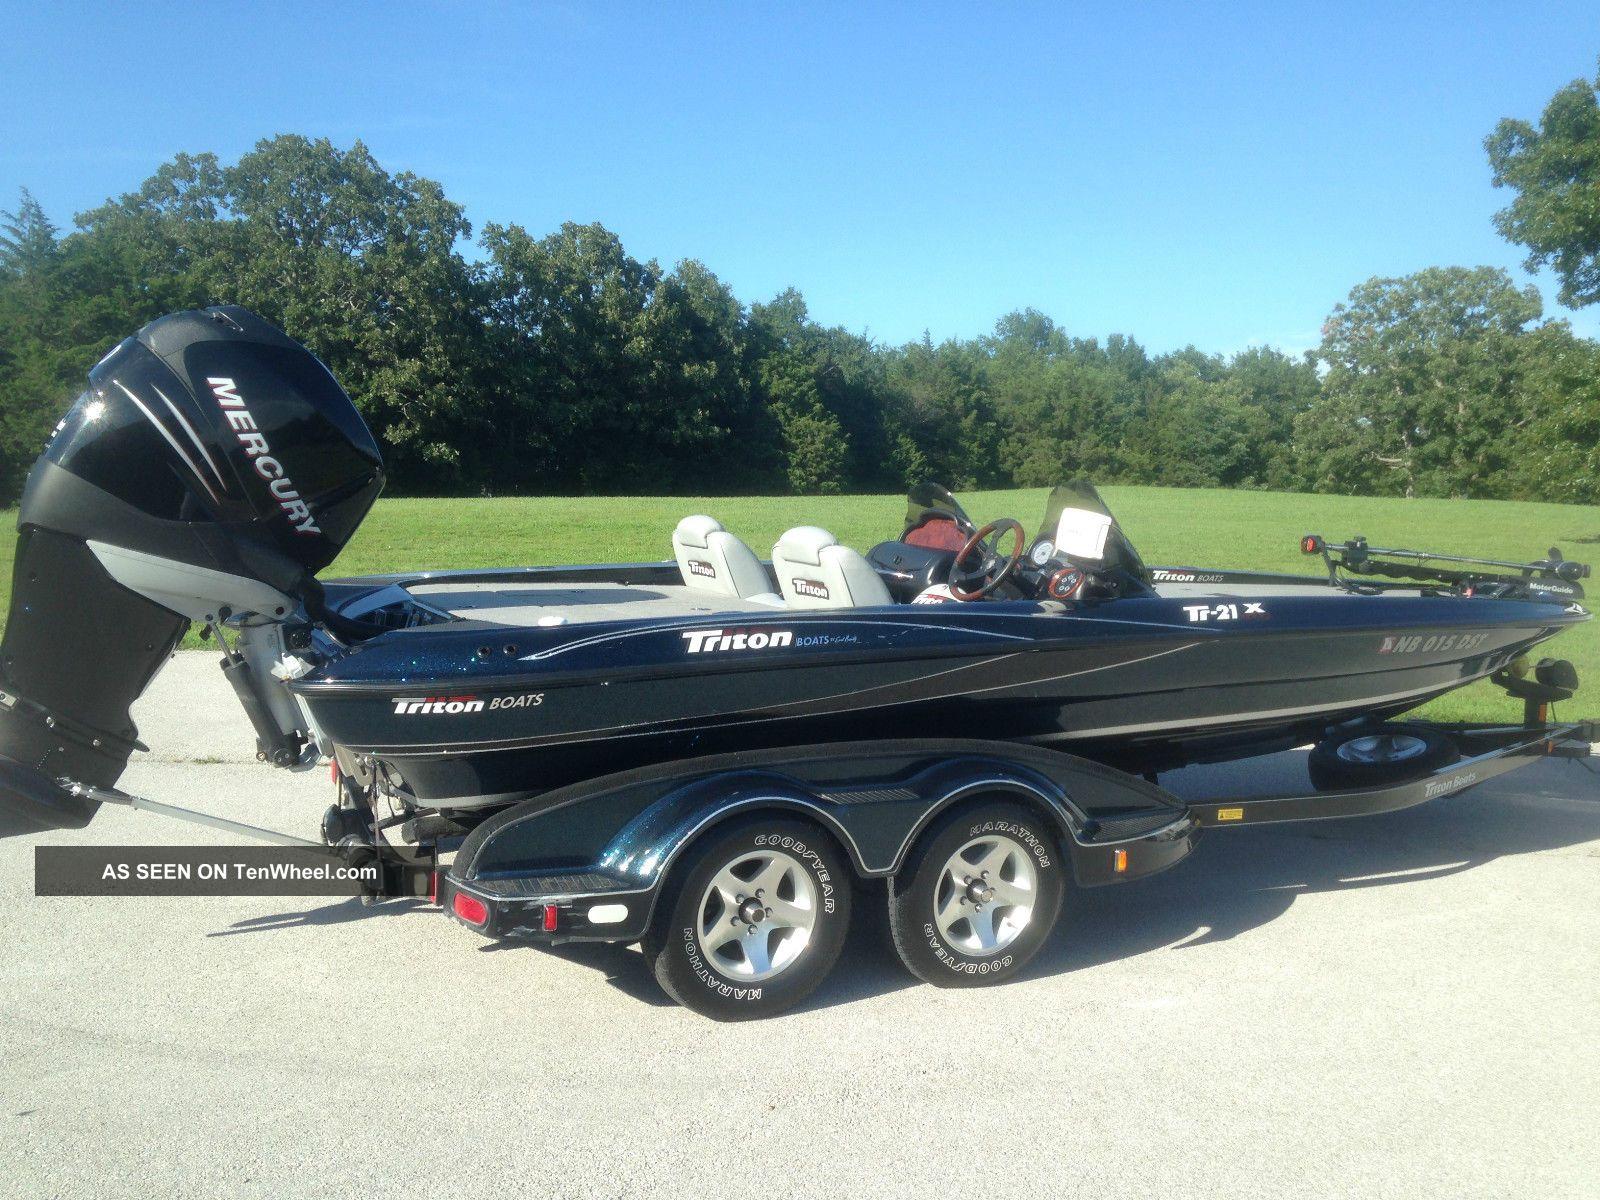 2005 Triton Tr21x Limited Edition Bass Fishing Boats photo